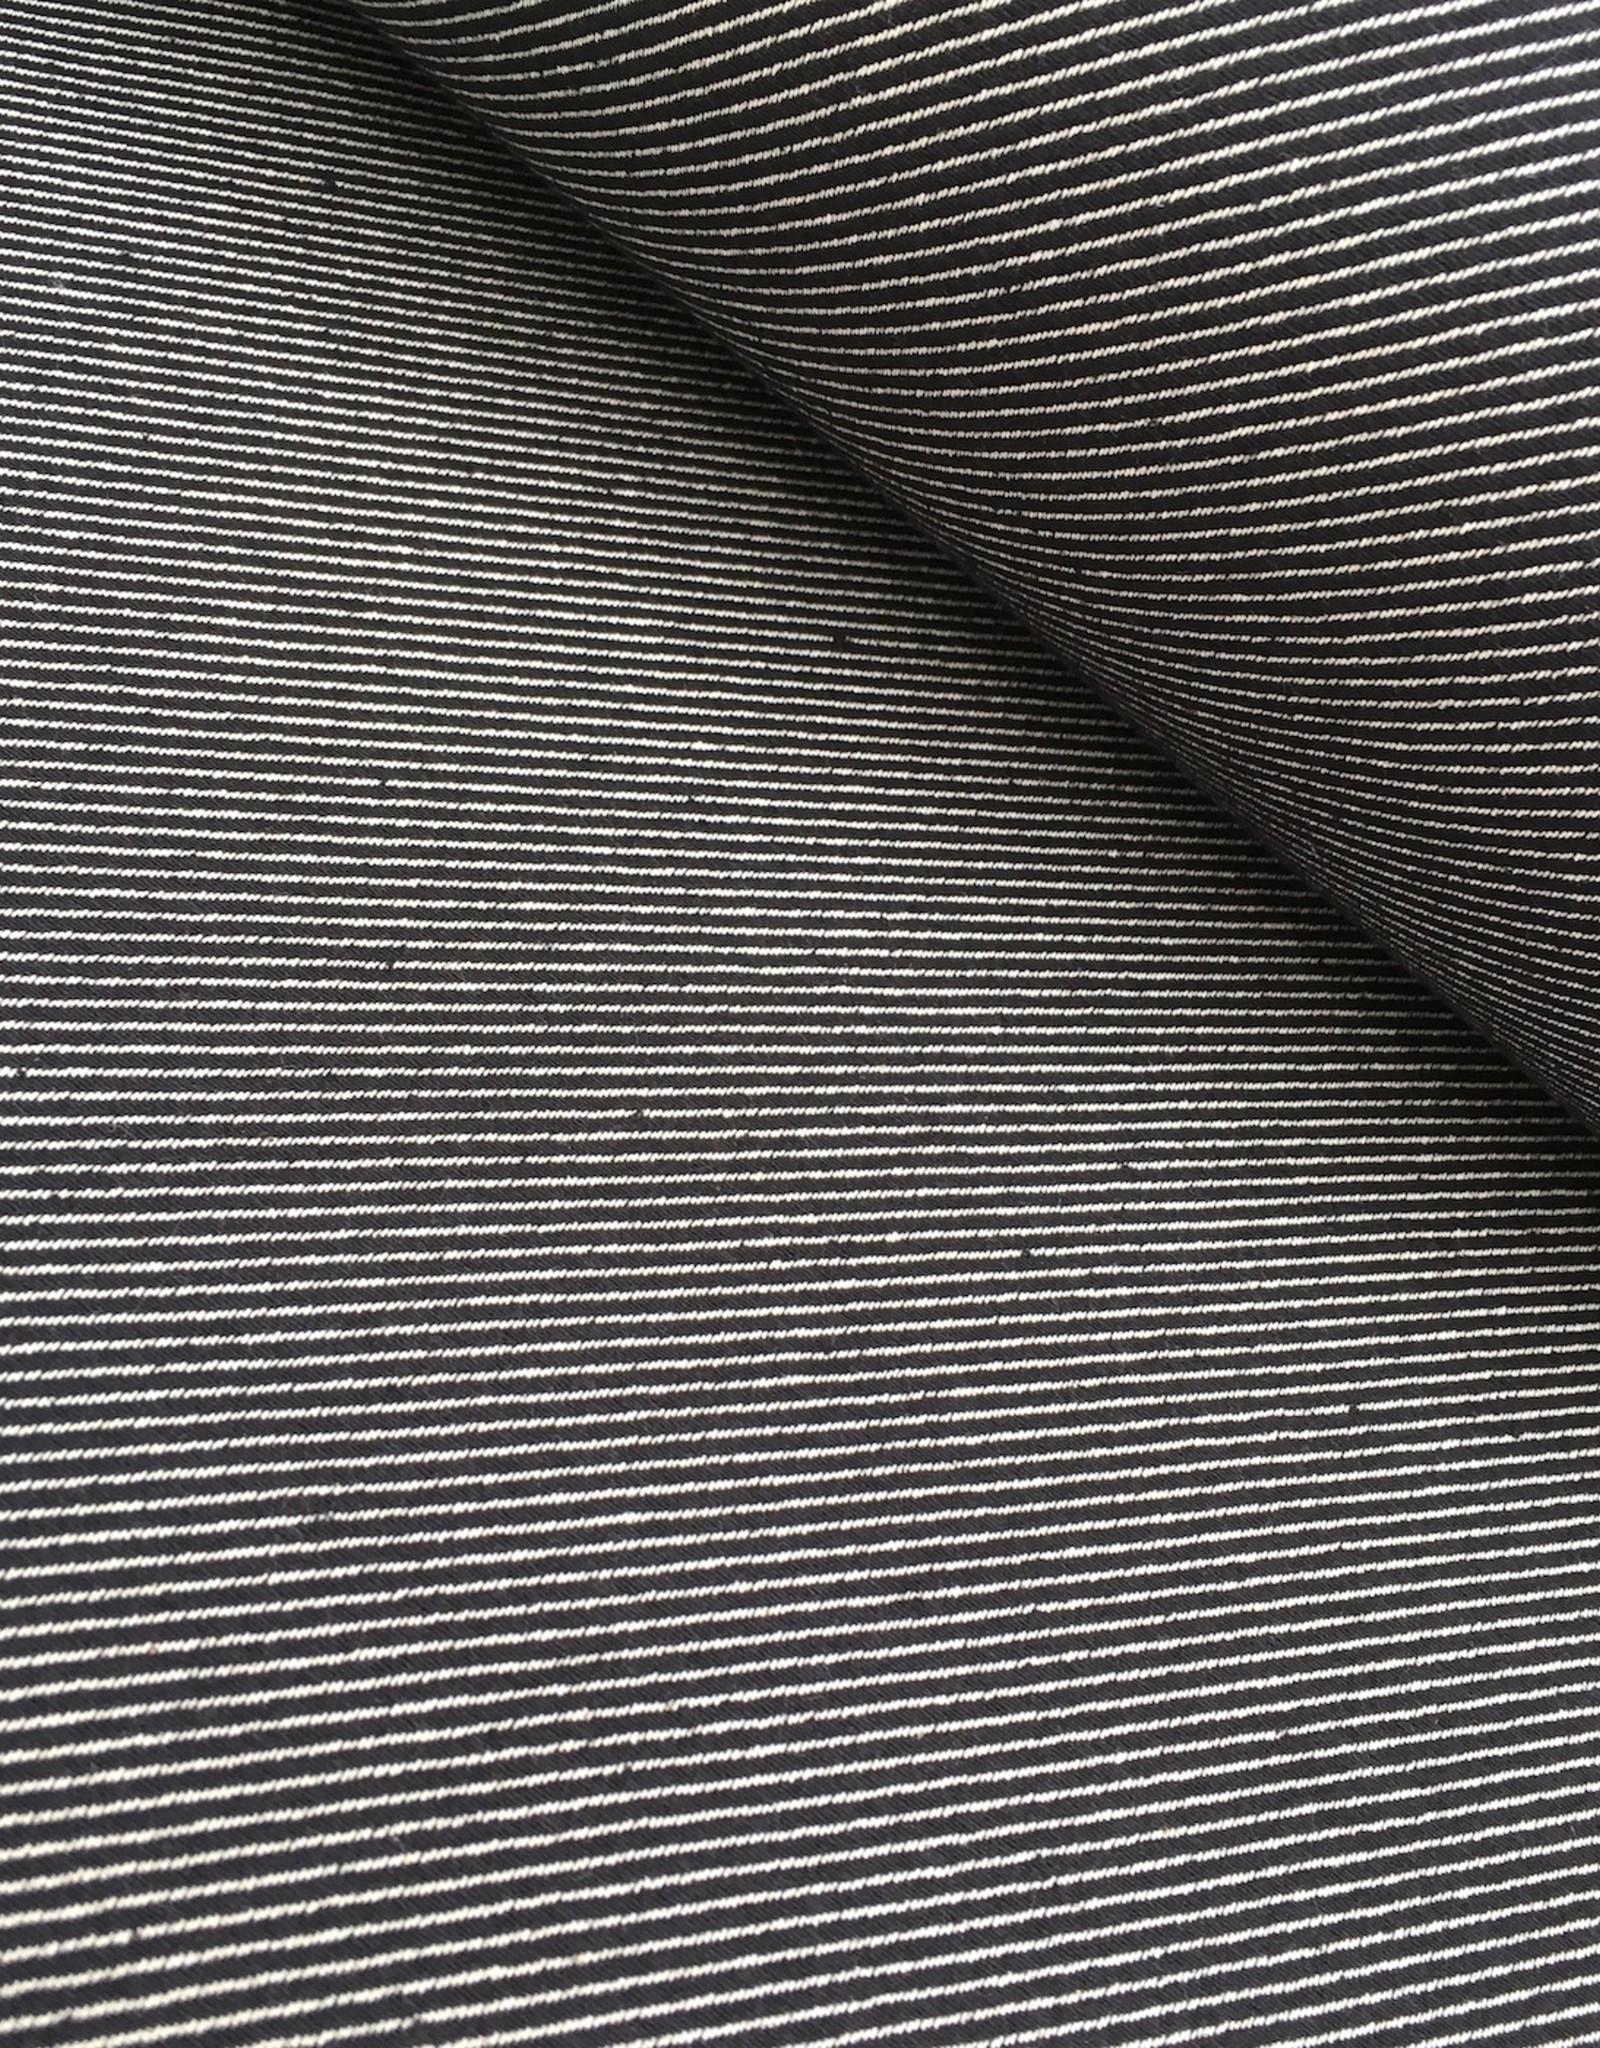 Canvas - Jaquard - Diagonaal - Zwart